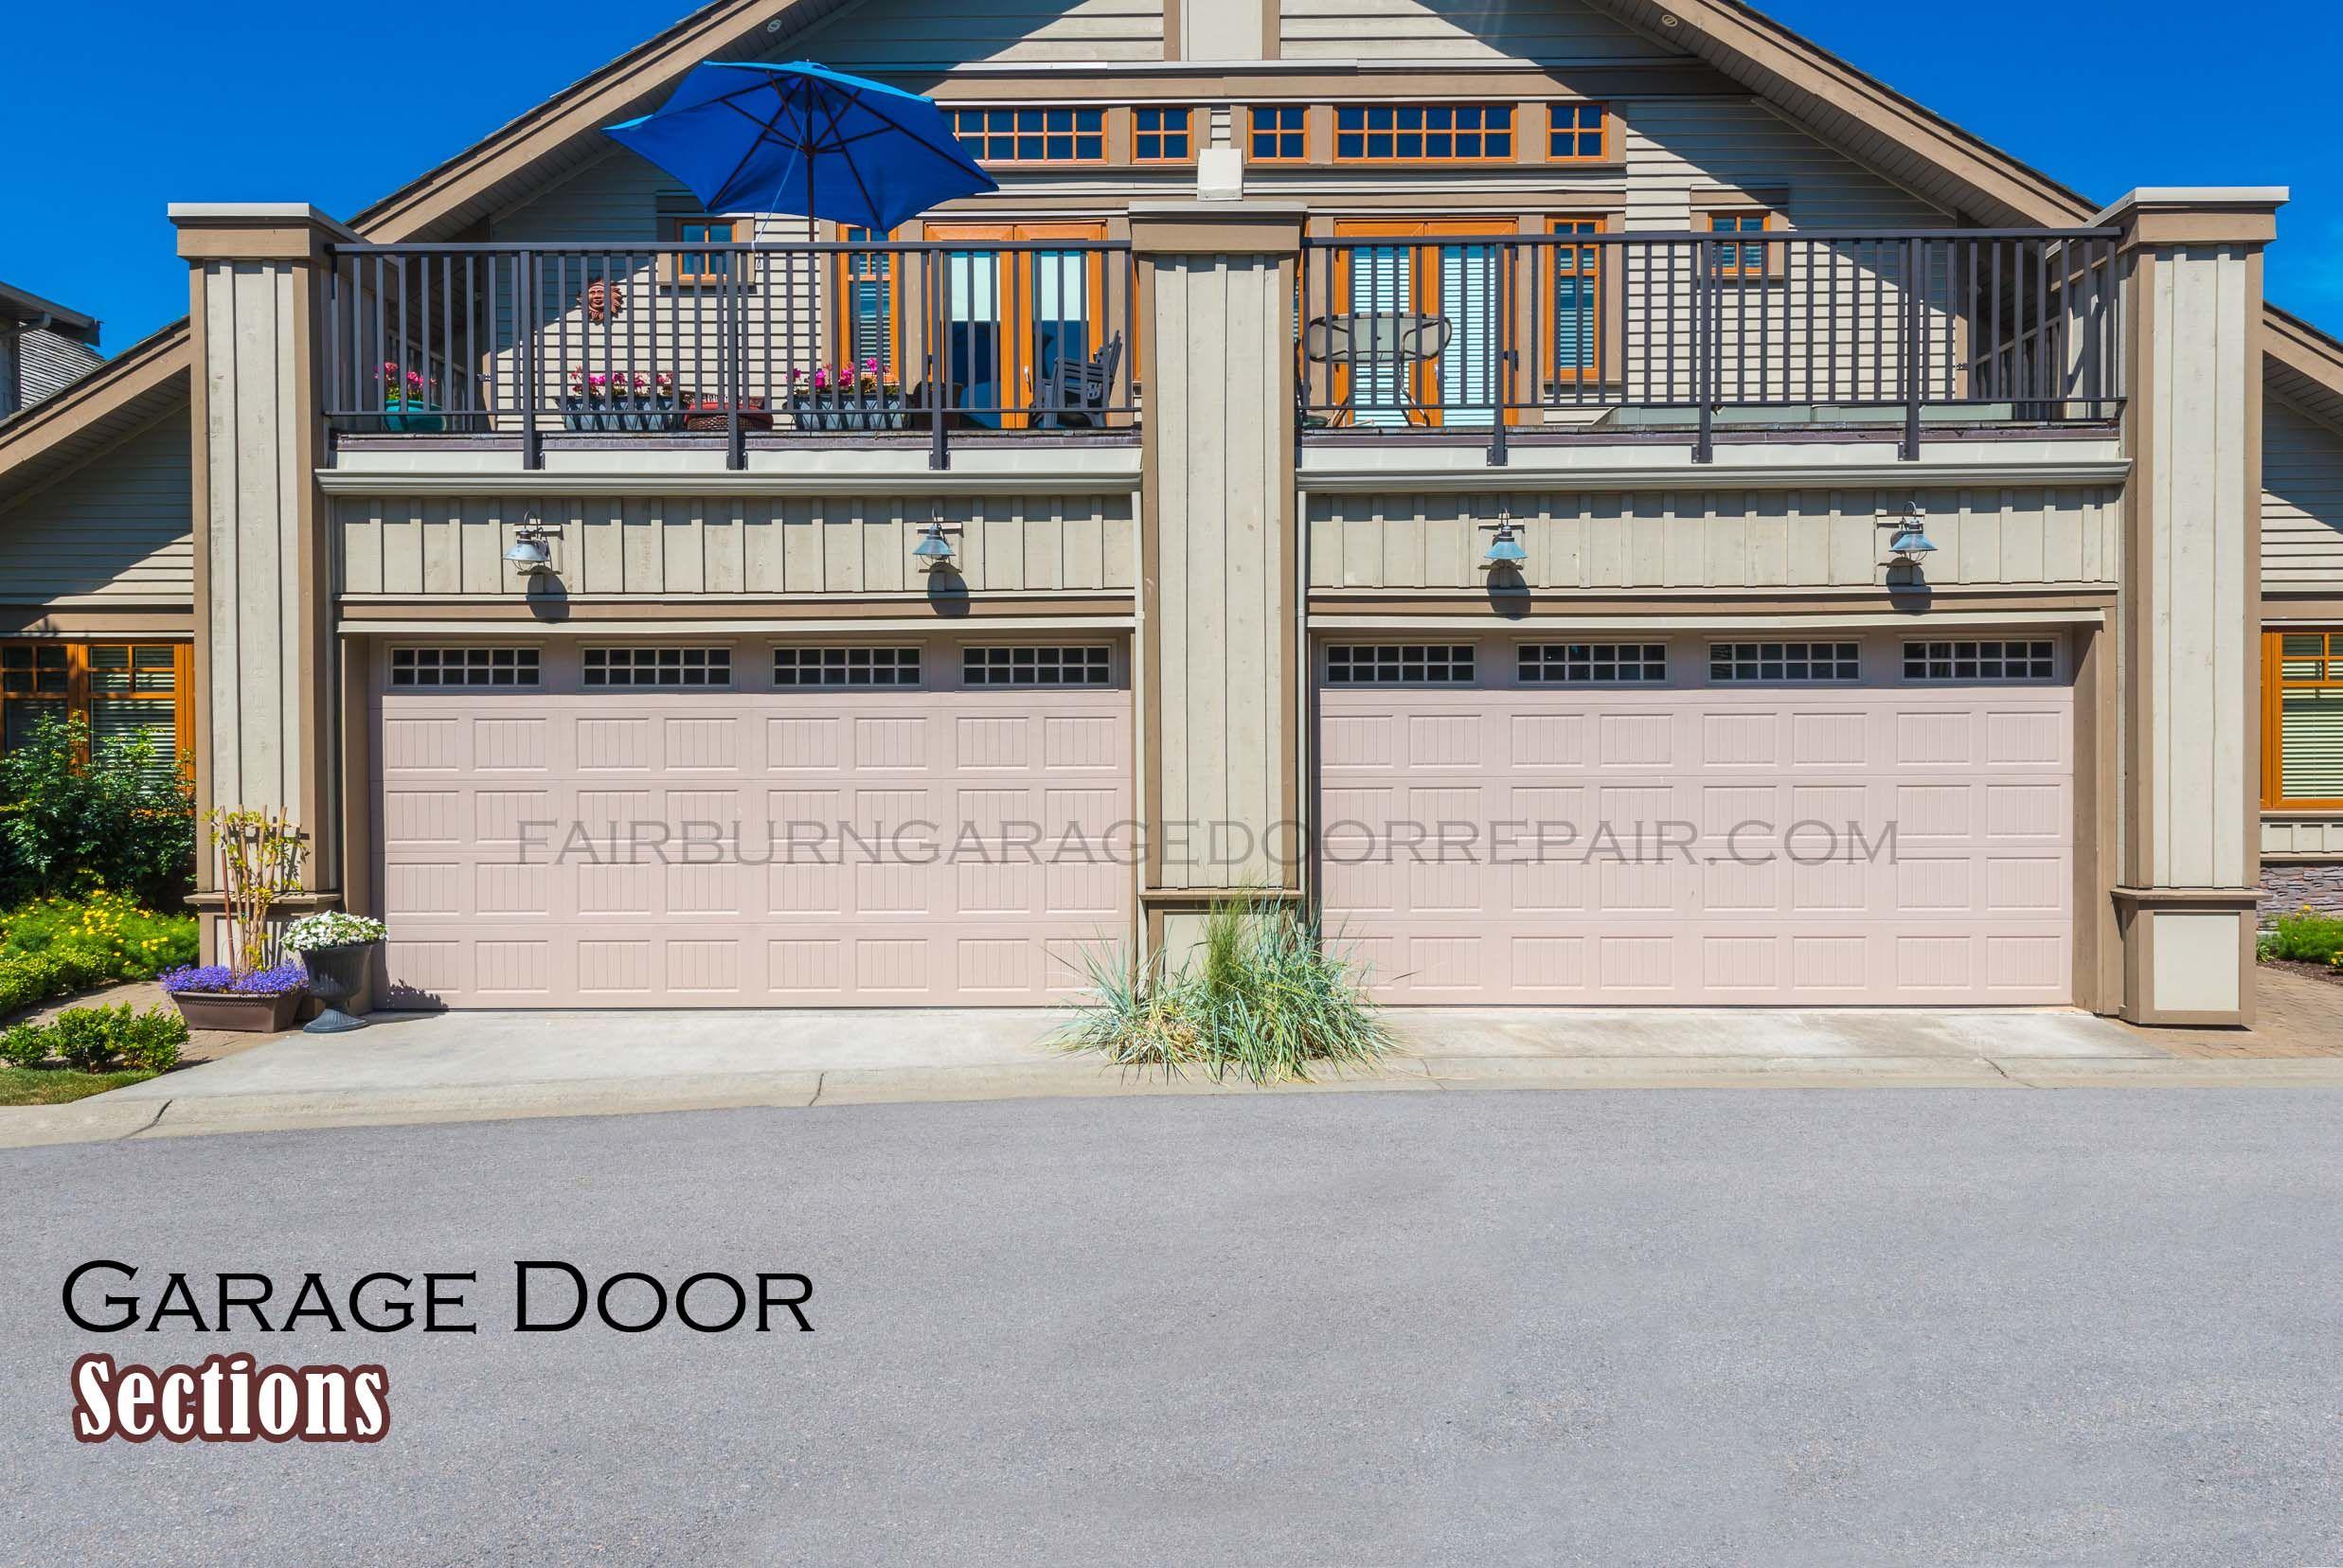 Fairburn Garage Door Sections With Images Garage Doors Garage Door Repair Service Garage Door Repair